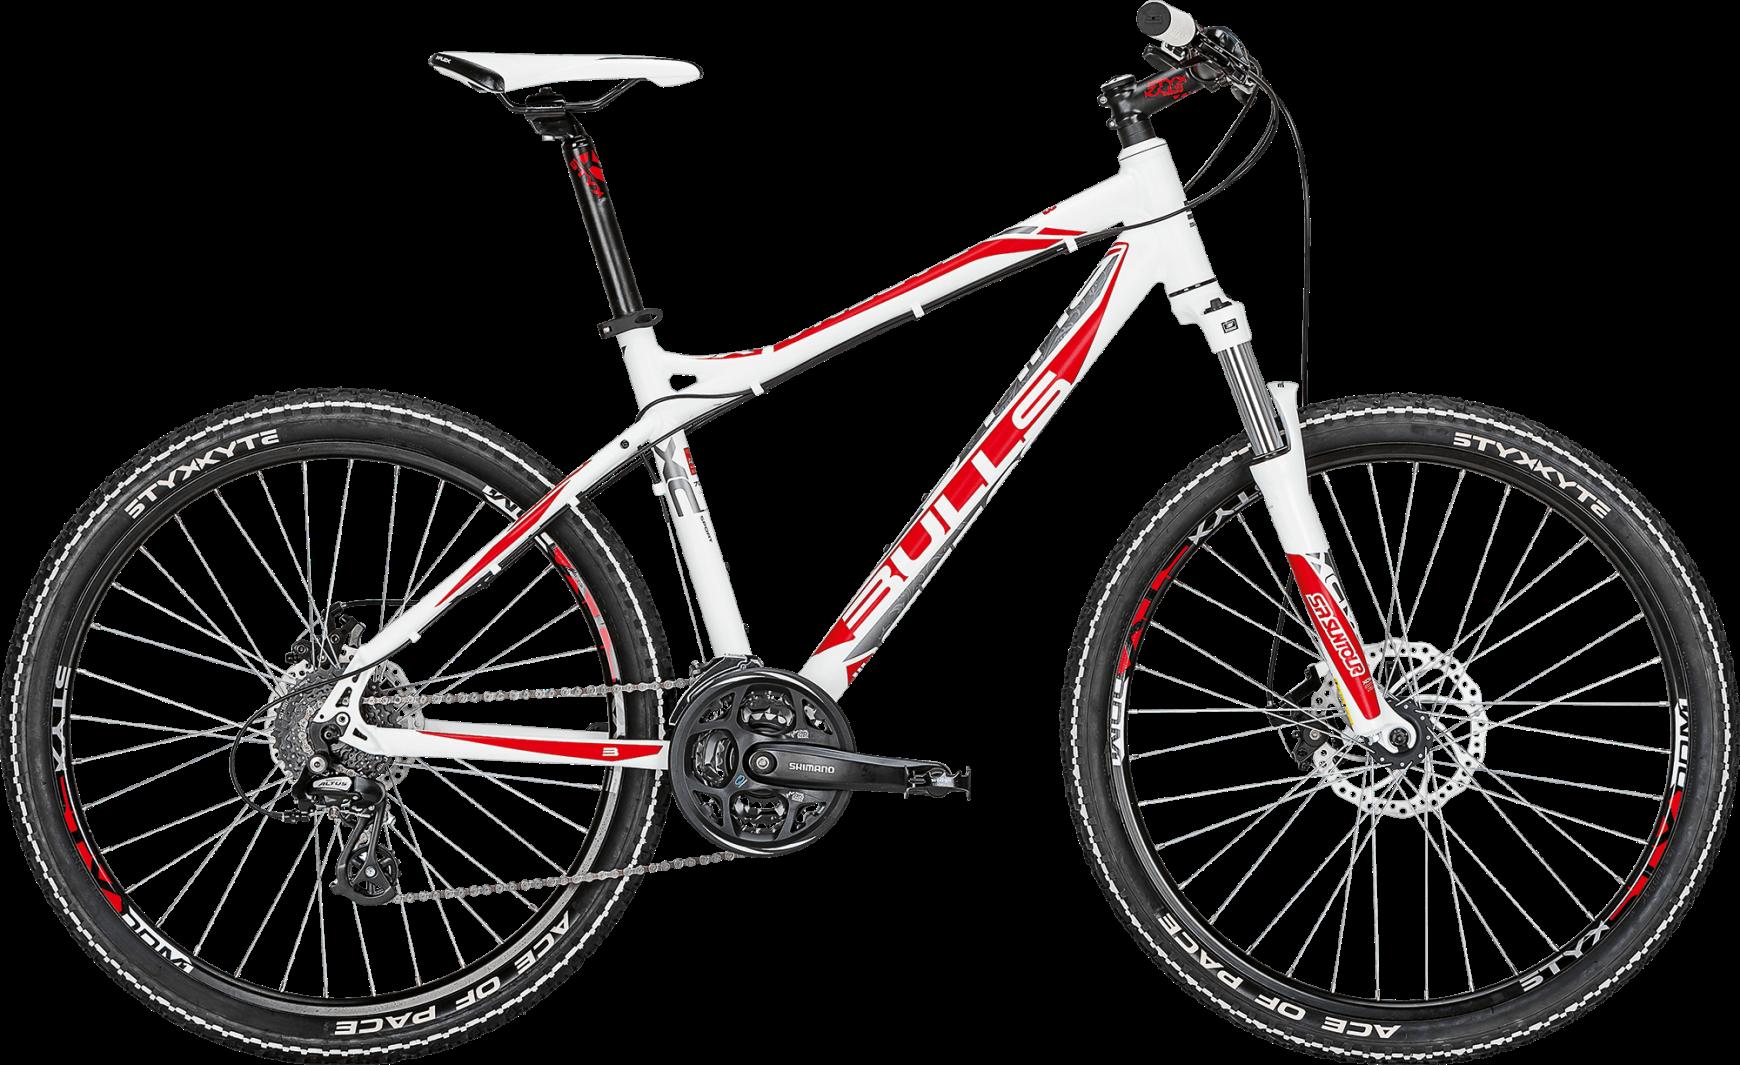 damen mountainbike bulls zarena 2014 fahrrad shimano 24g. Black Bedroom Furniture Sets. Home Design Ideas